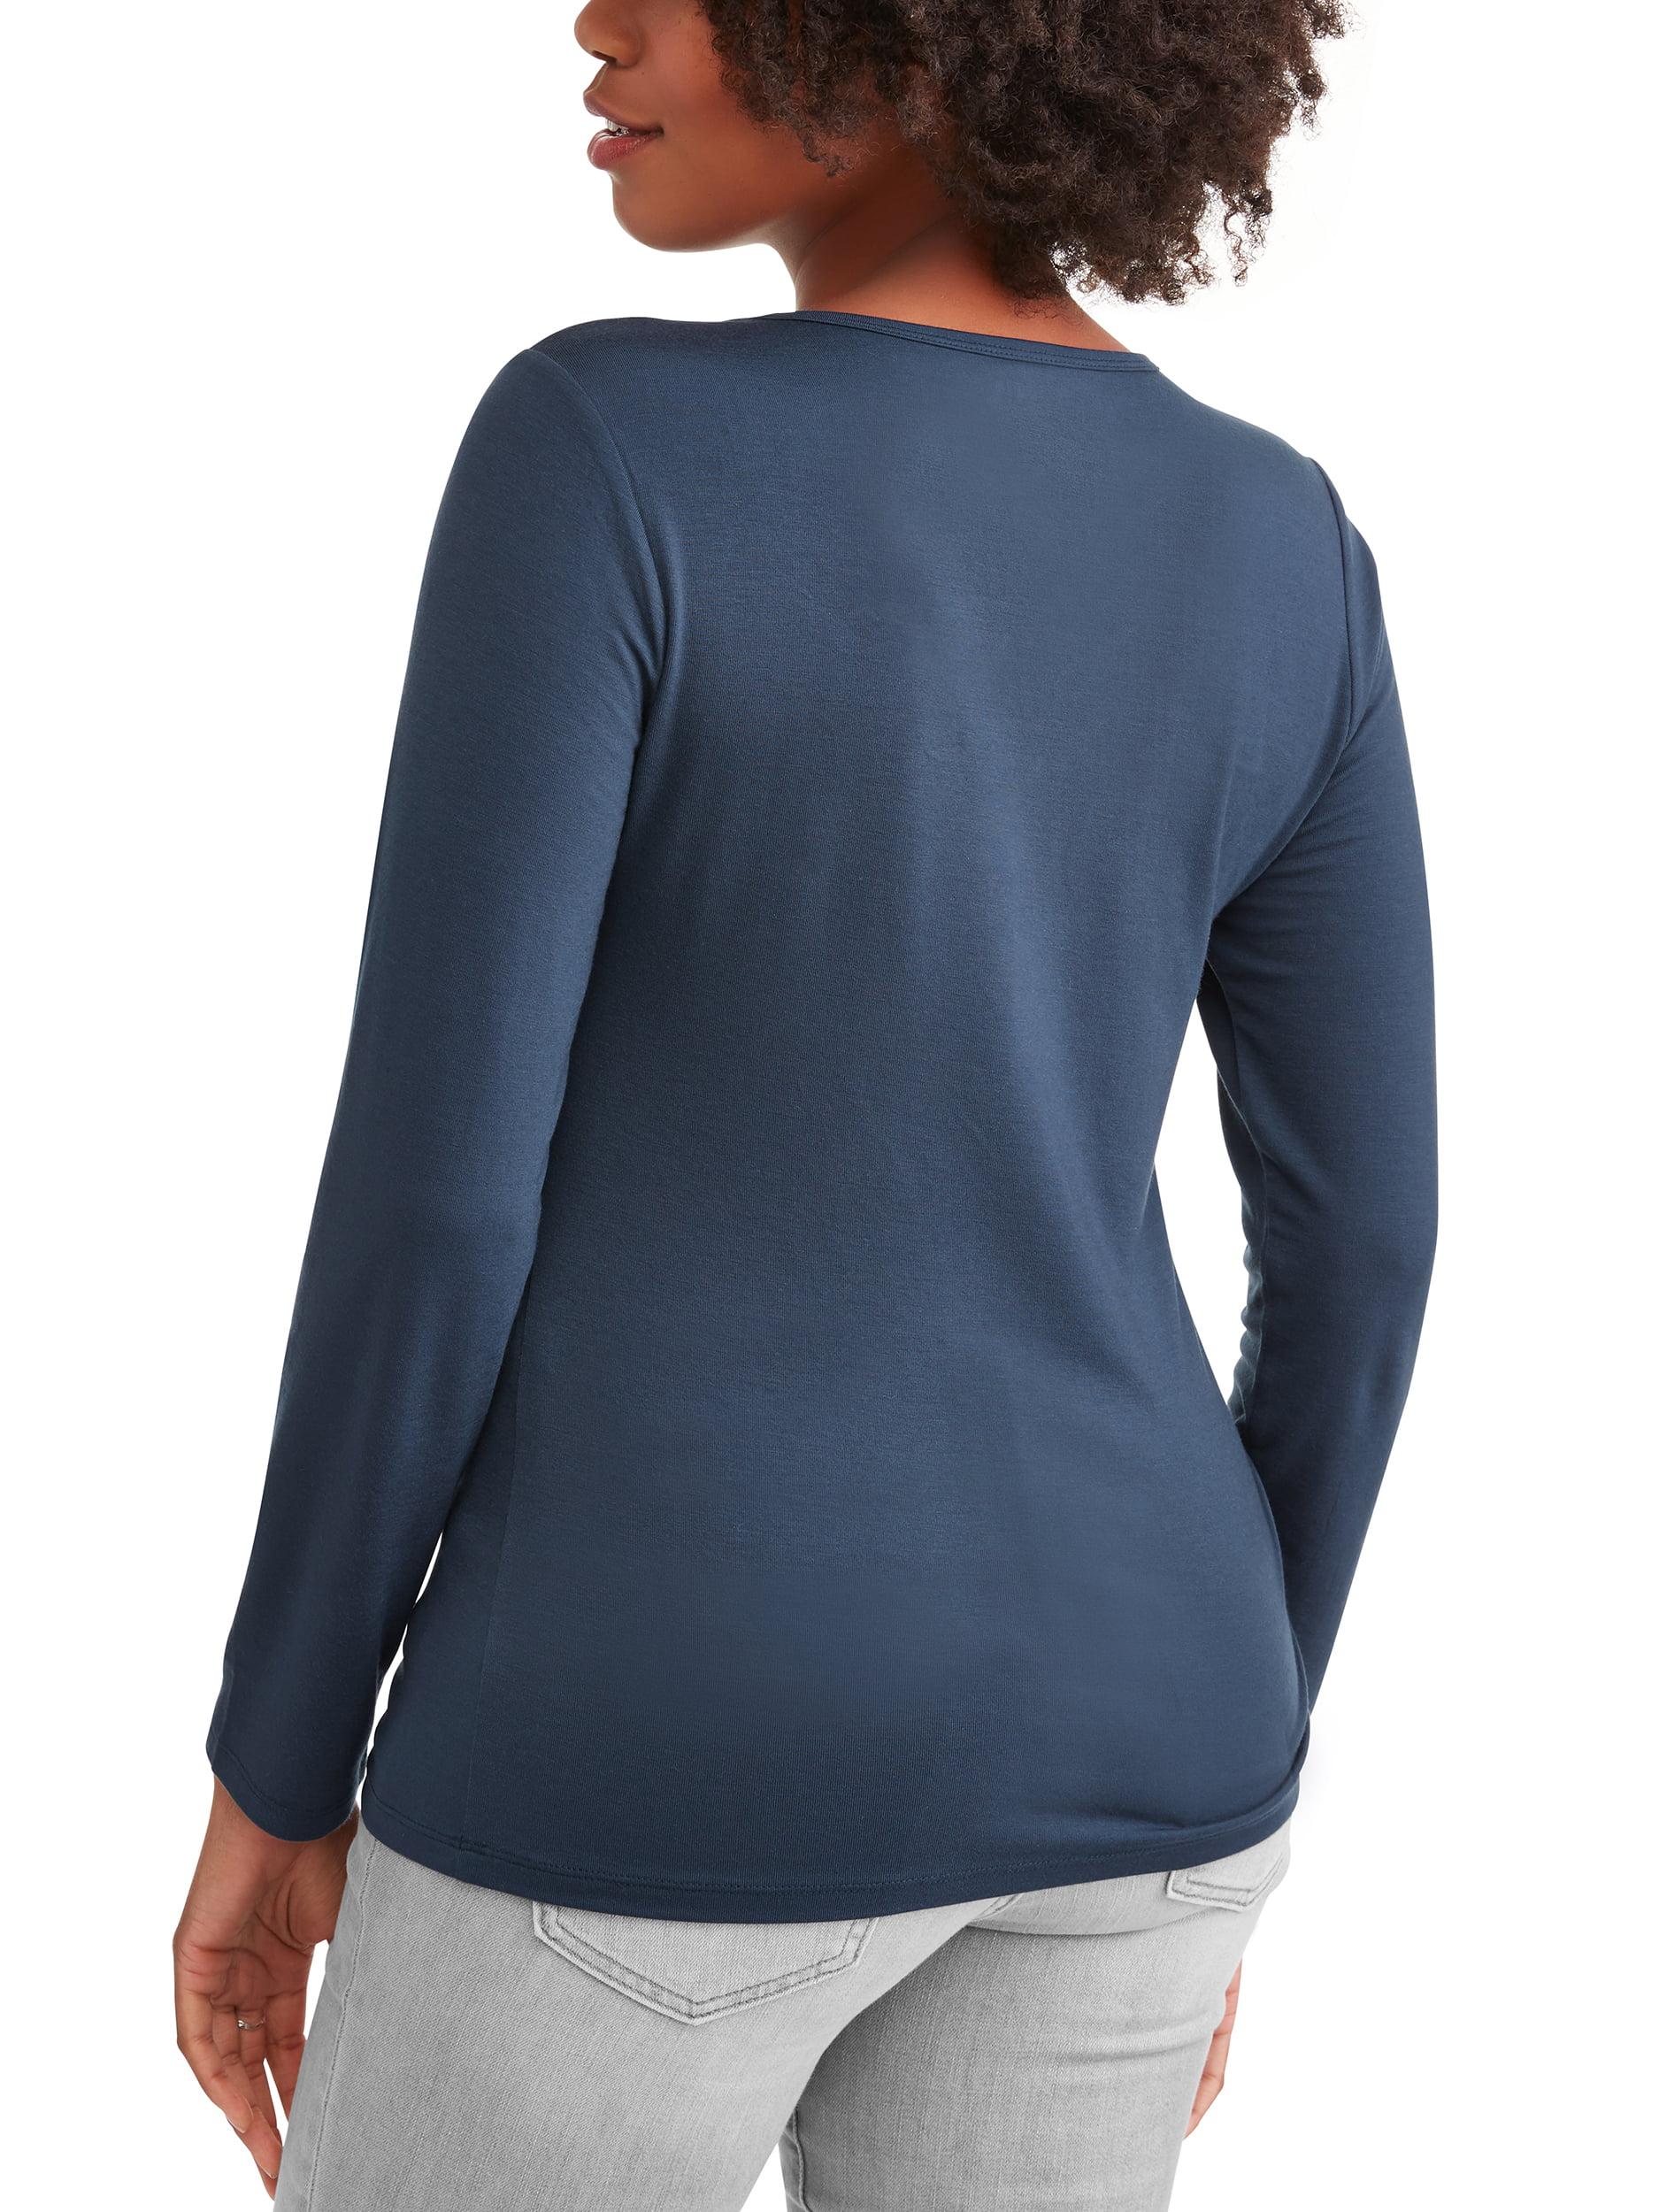 Women's Long Sleeve V-Neck T-Shirt, 2-Pack Bundle